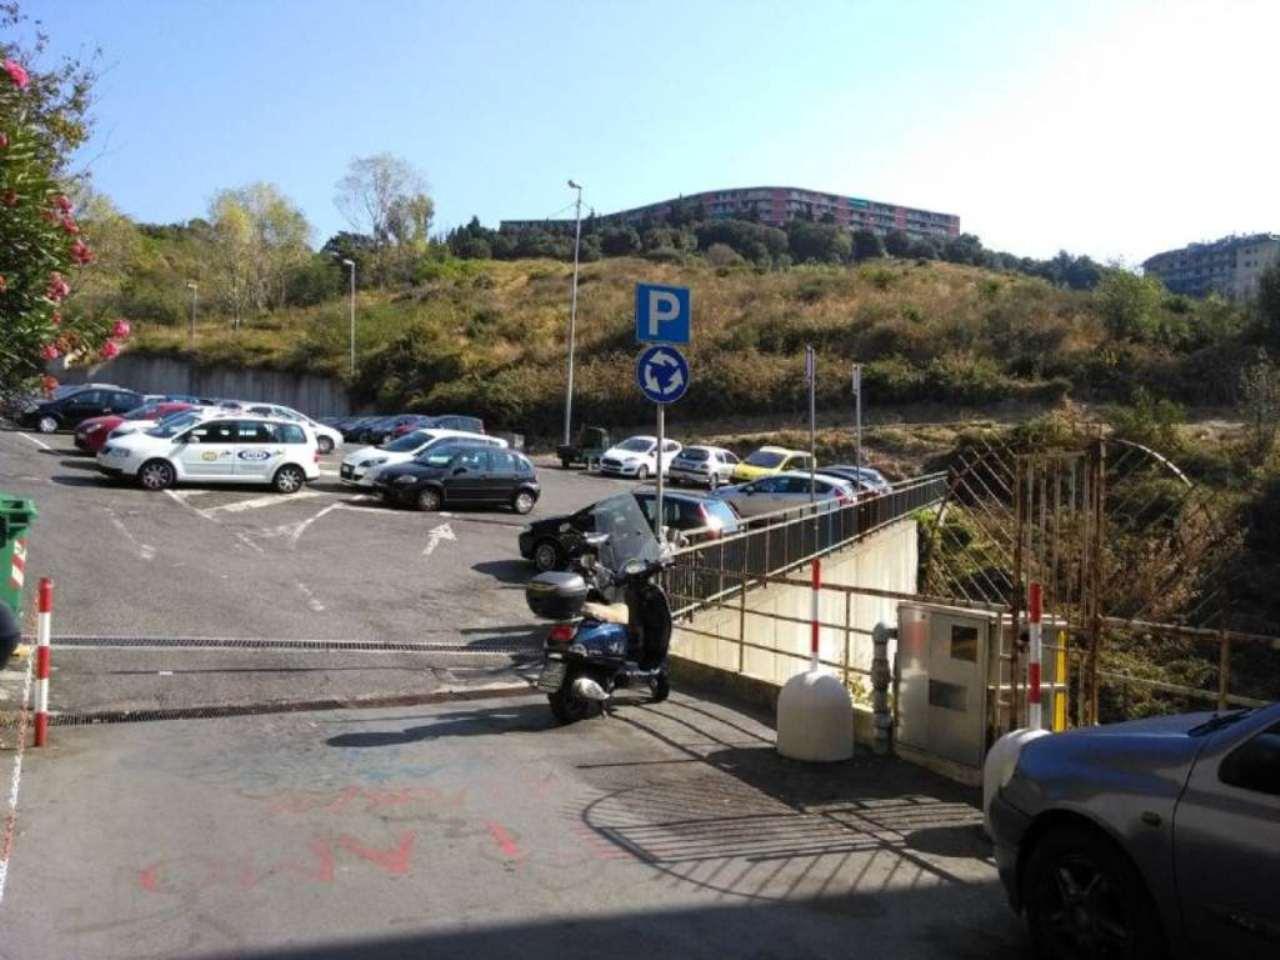 Bilocale Genova Via Monte Rosa 12